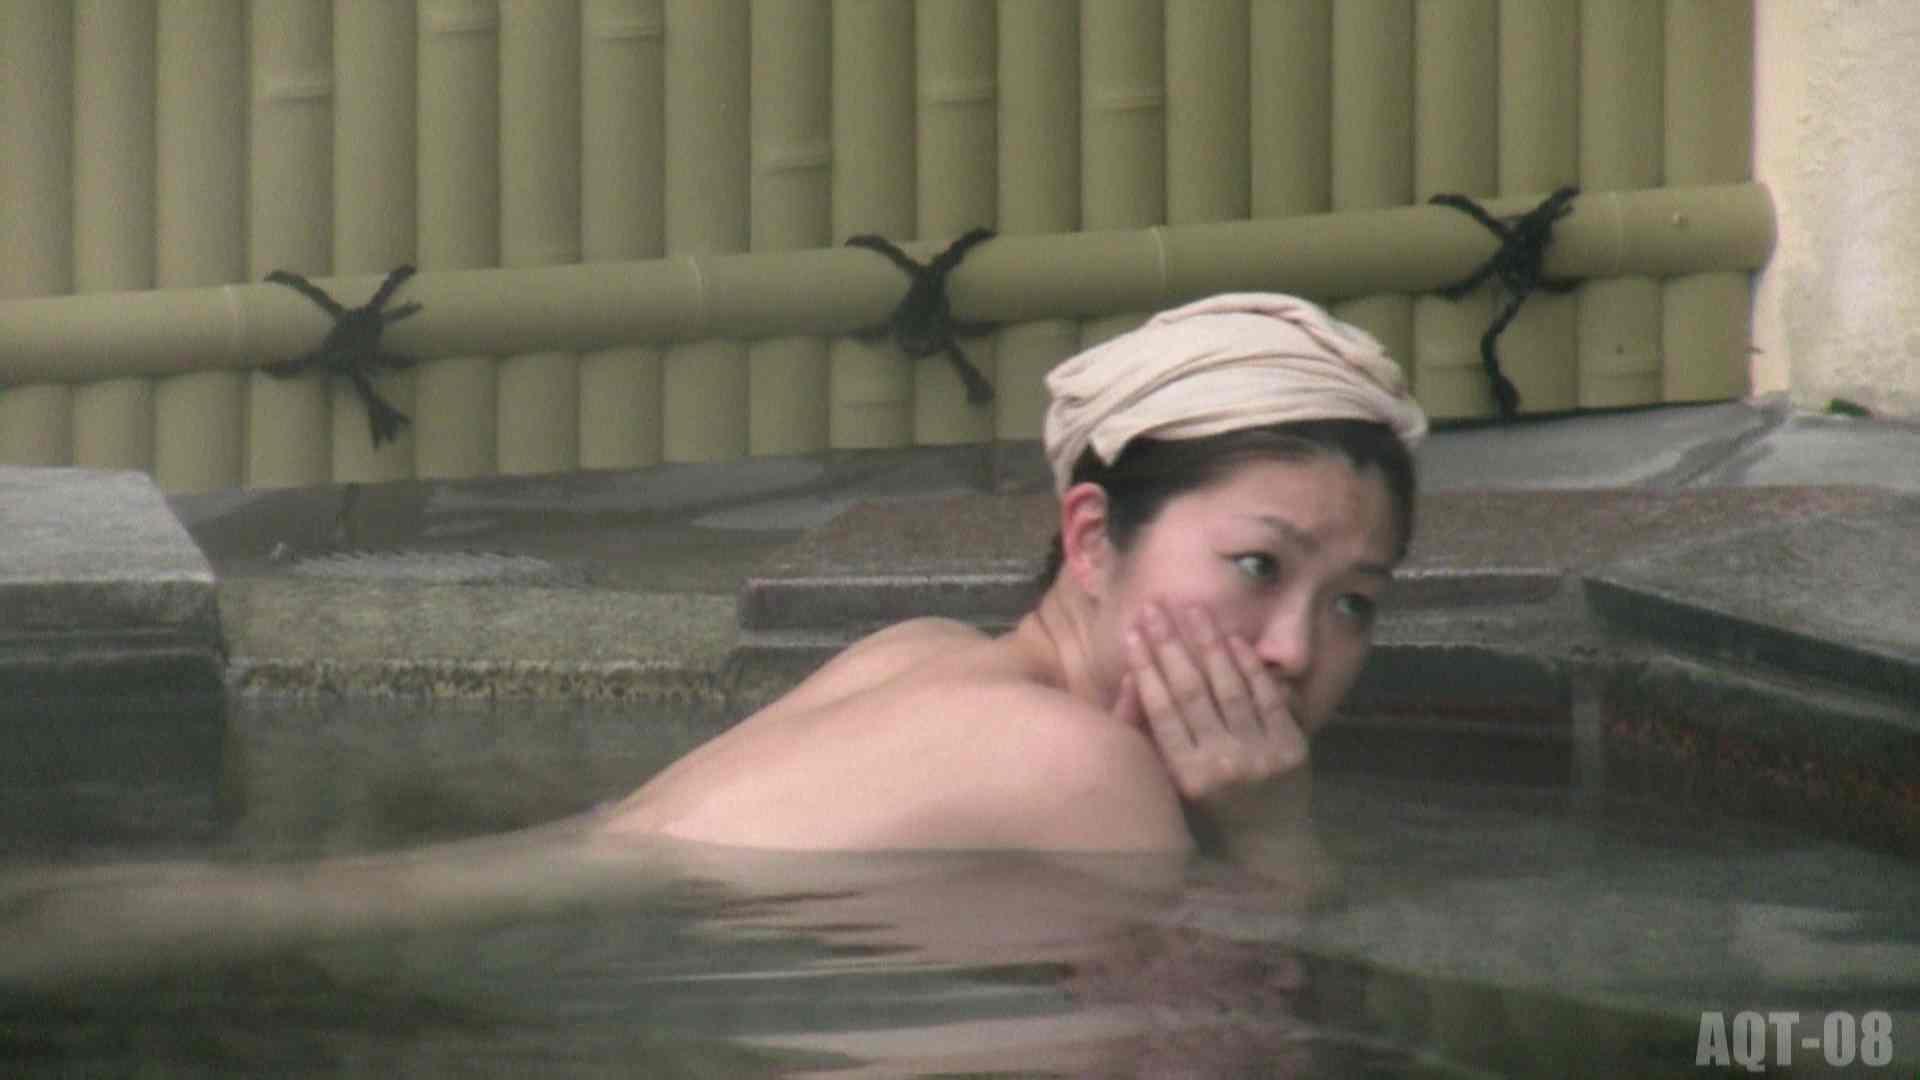 Aquaな露天風呂Vol.772 OL女体  39連発 27